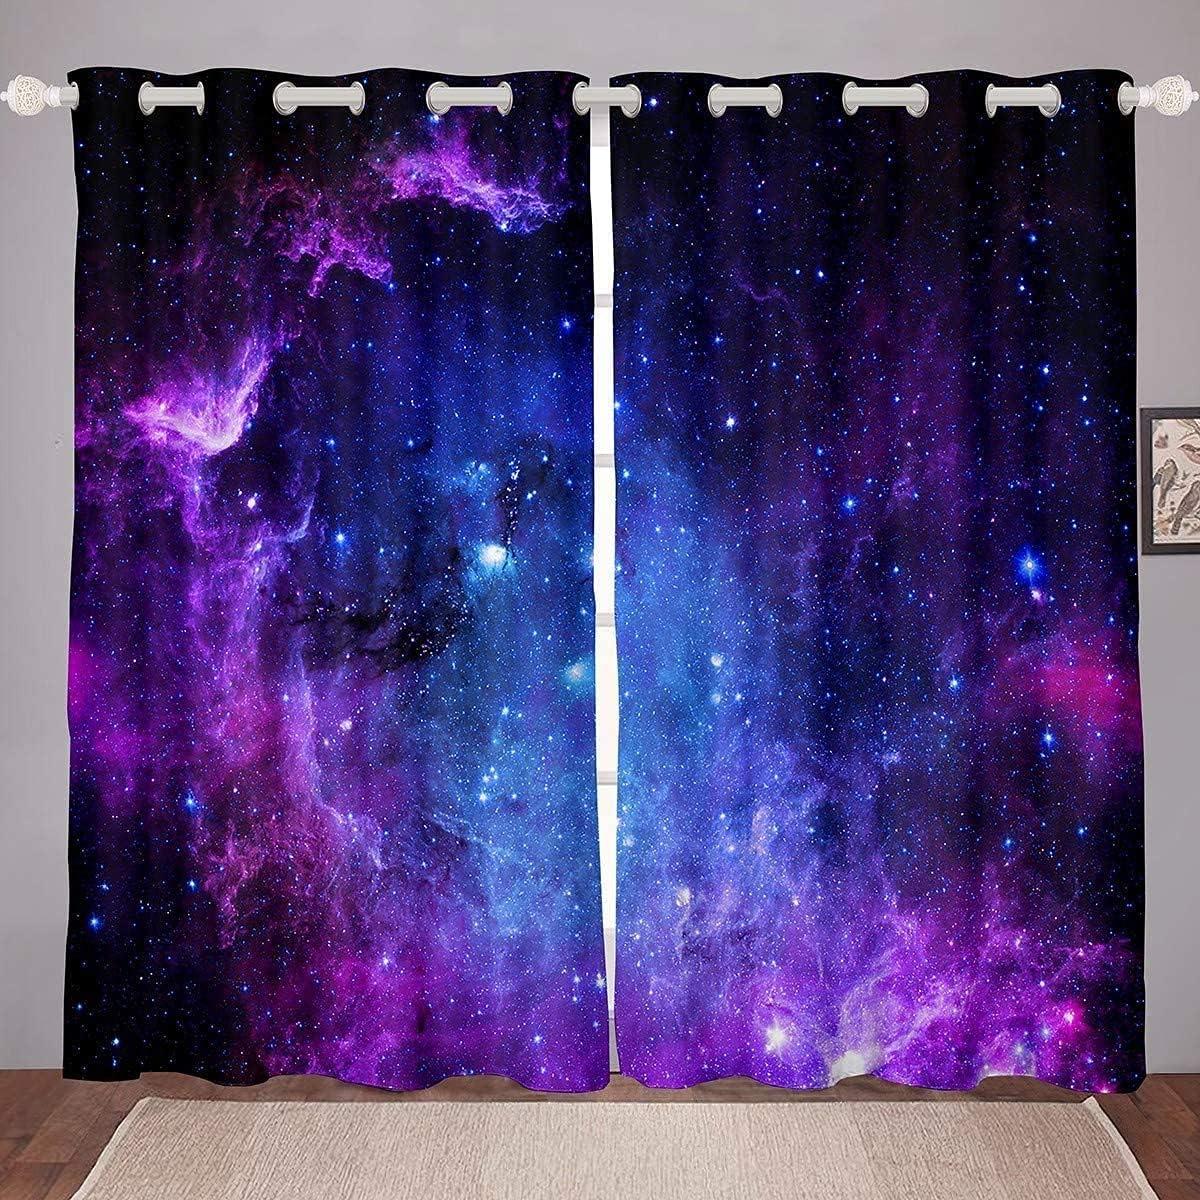 JOOCAR Blue Purple Starry High material Sky Blackout Grommet Insulate Super intense SALE Curtains